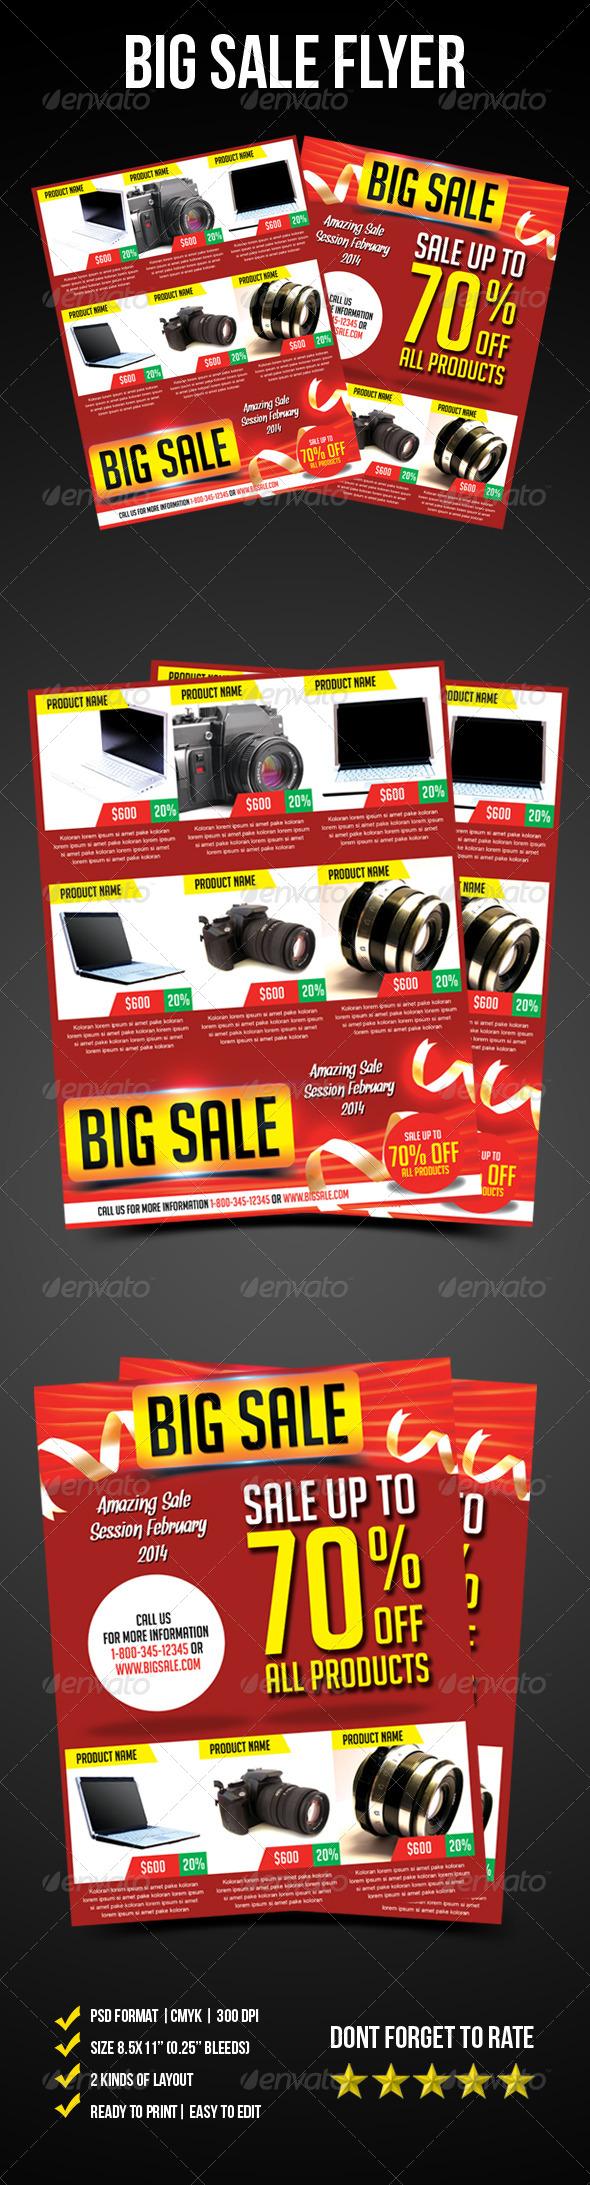 GraphicRiver Big Sale Flyer 6640629